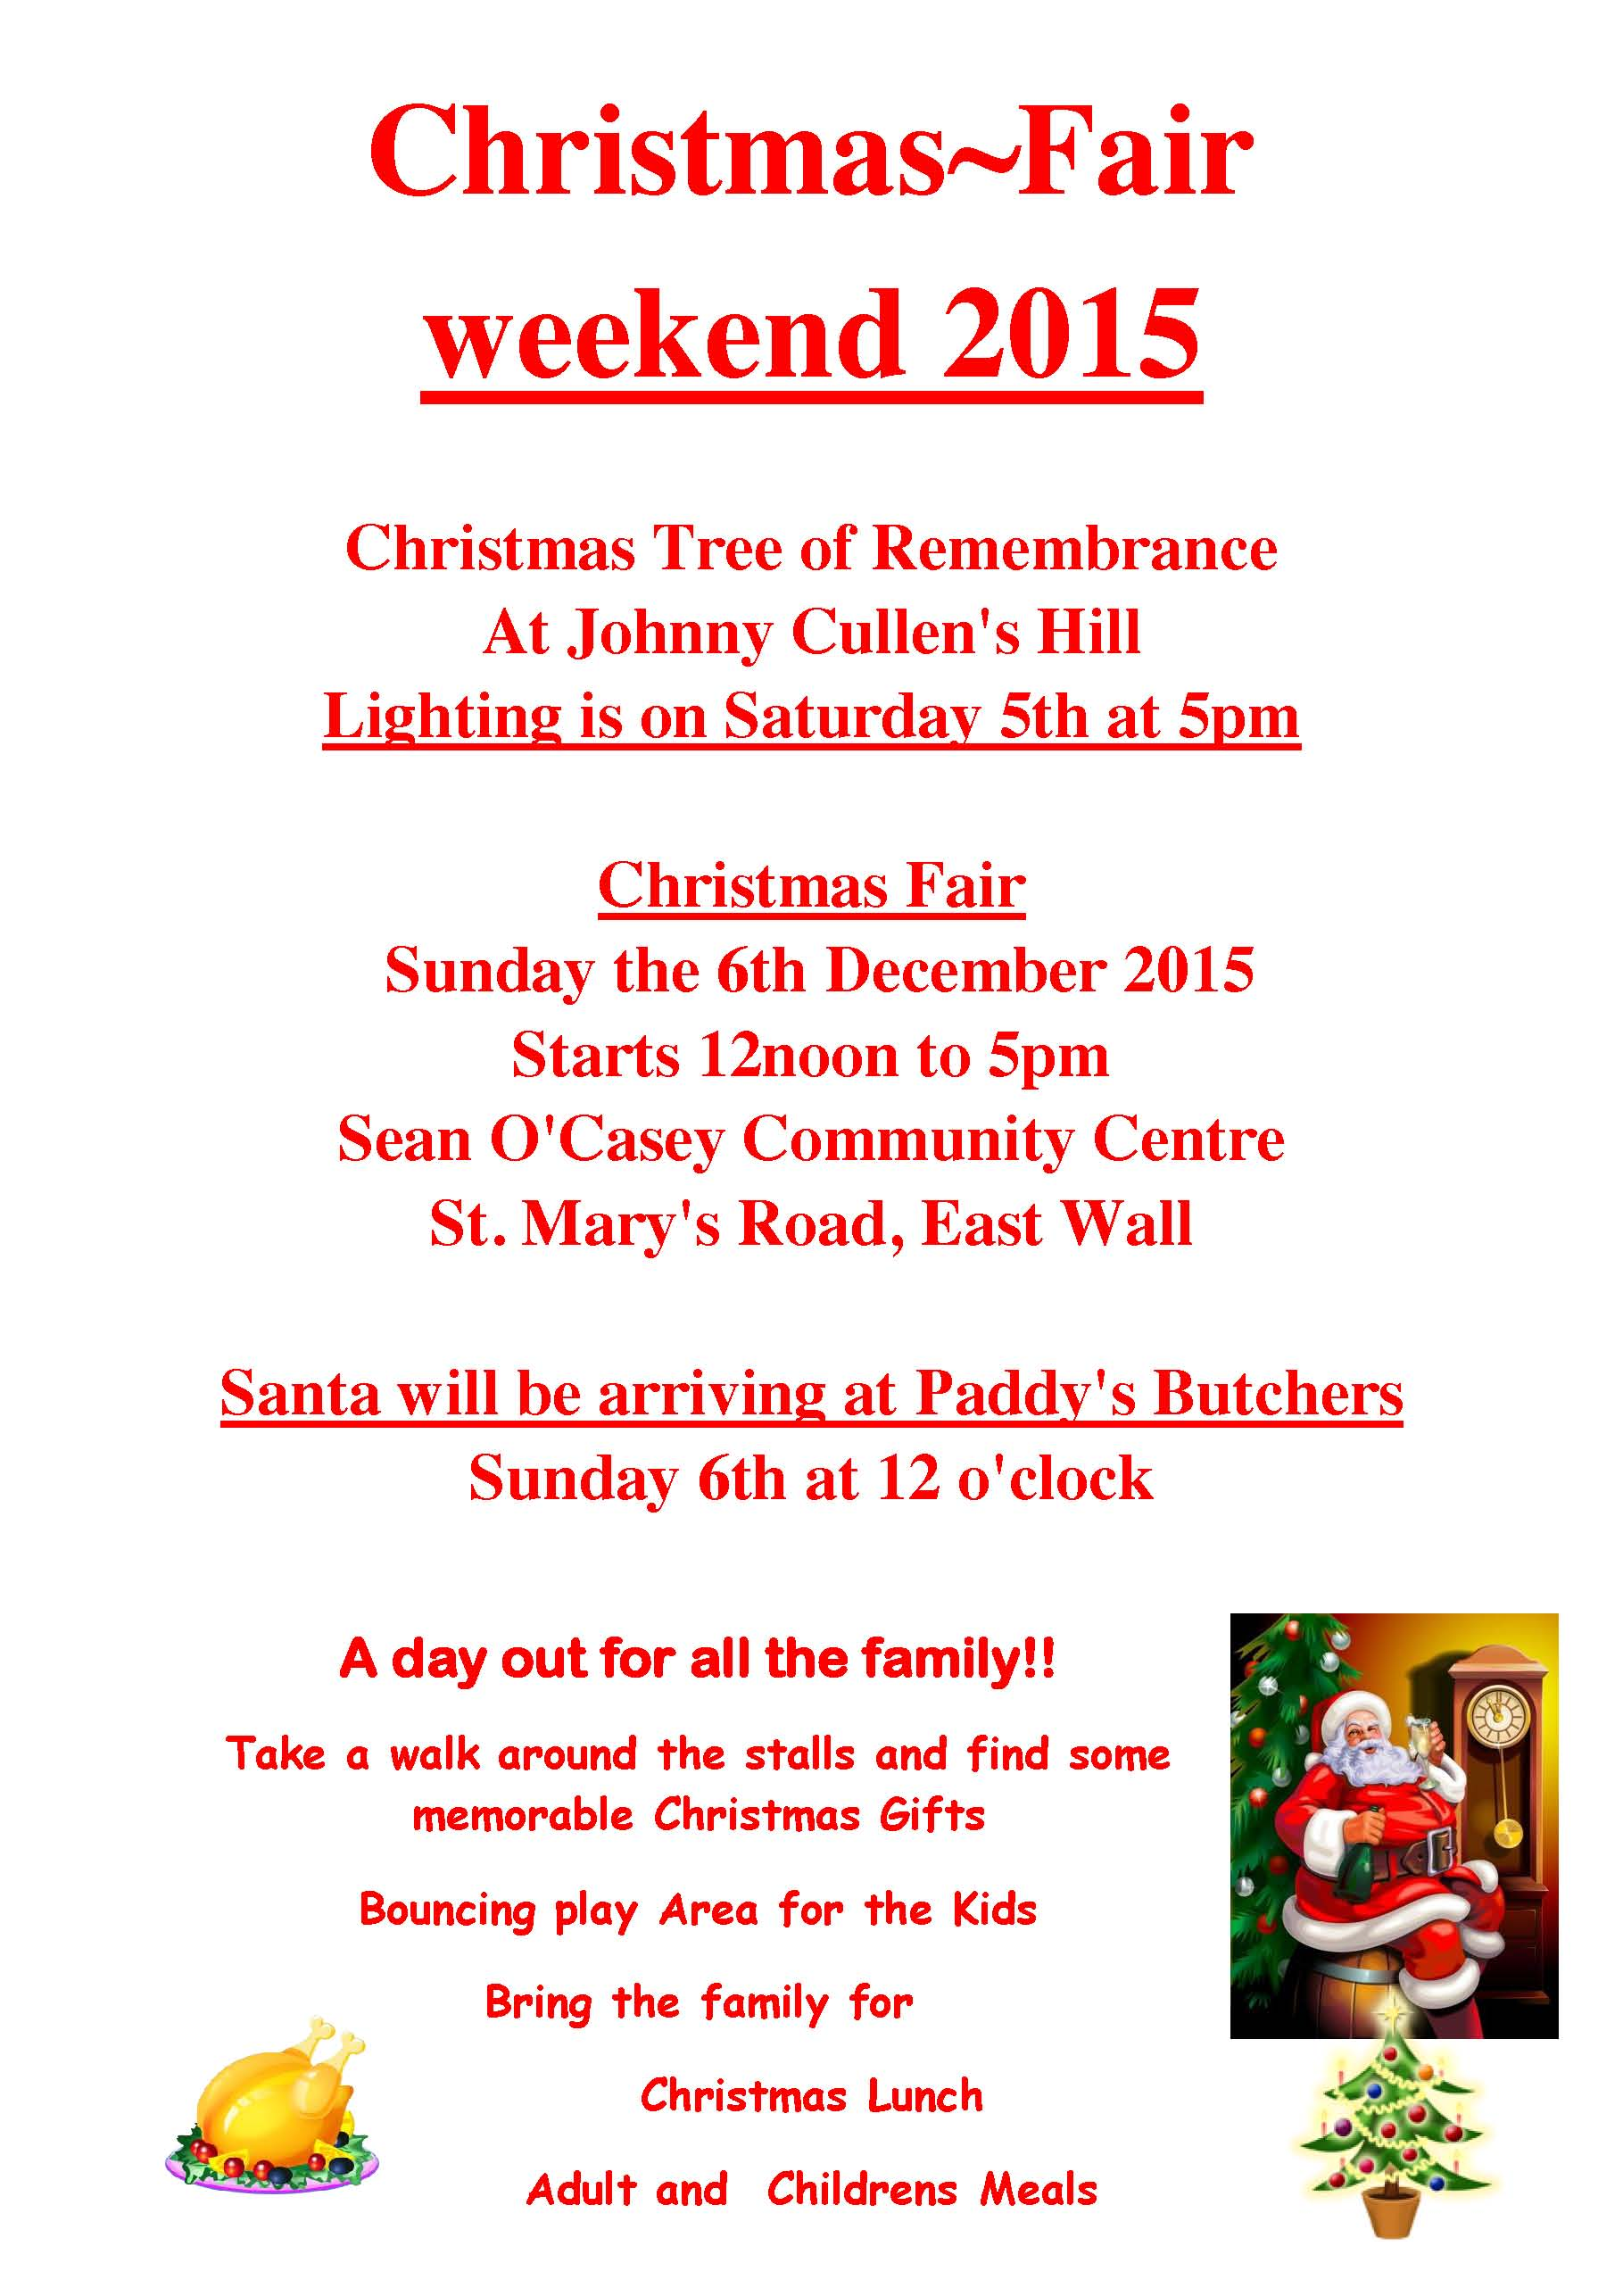 Christmas Fair 2015 weekend (1)_Page_1